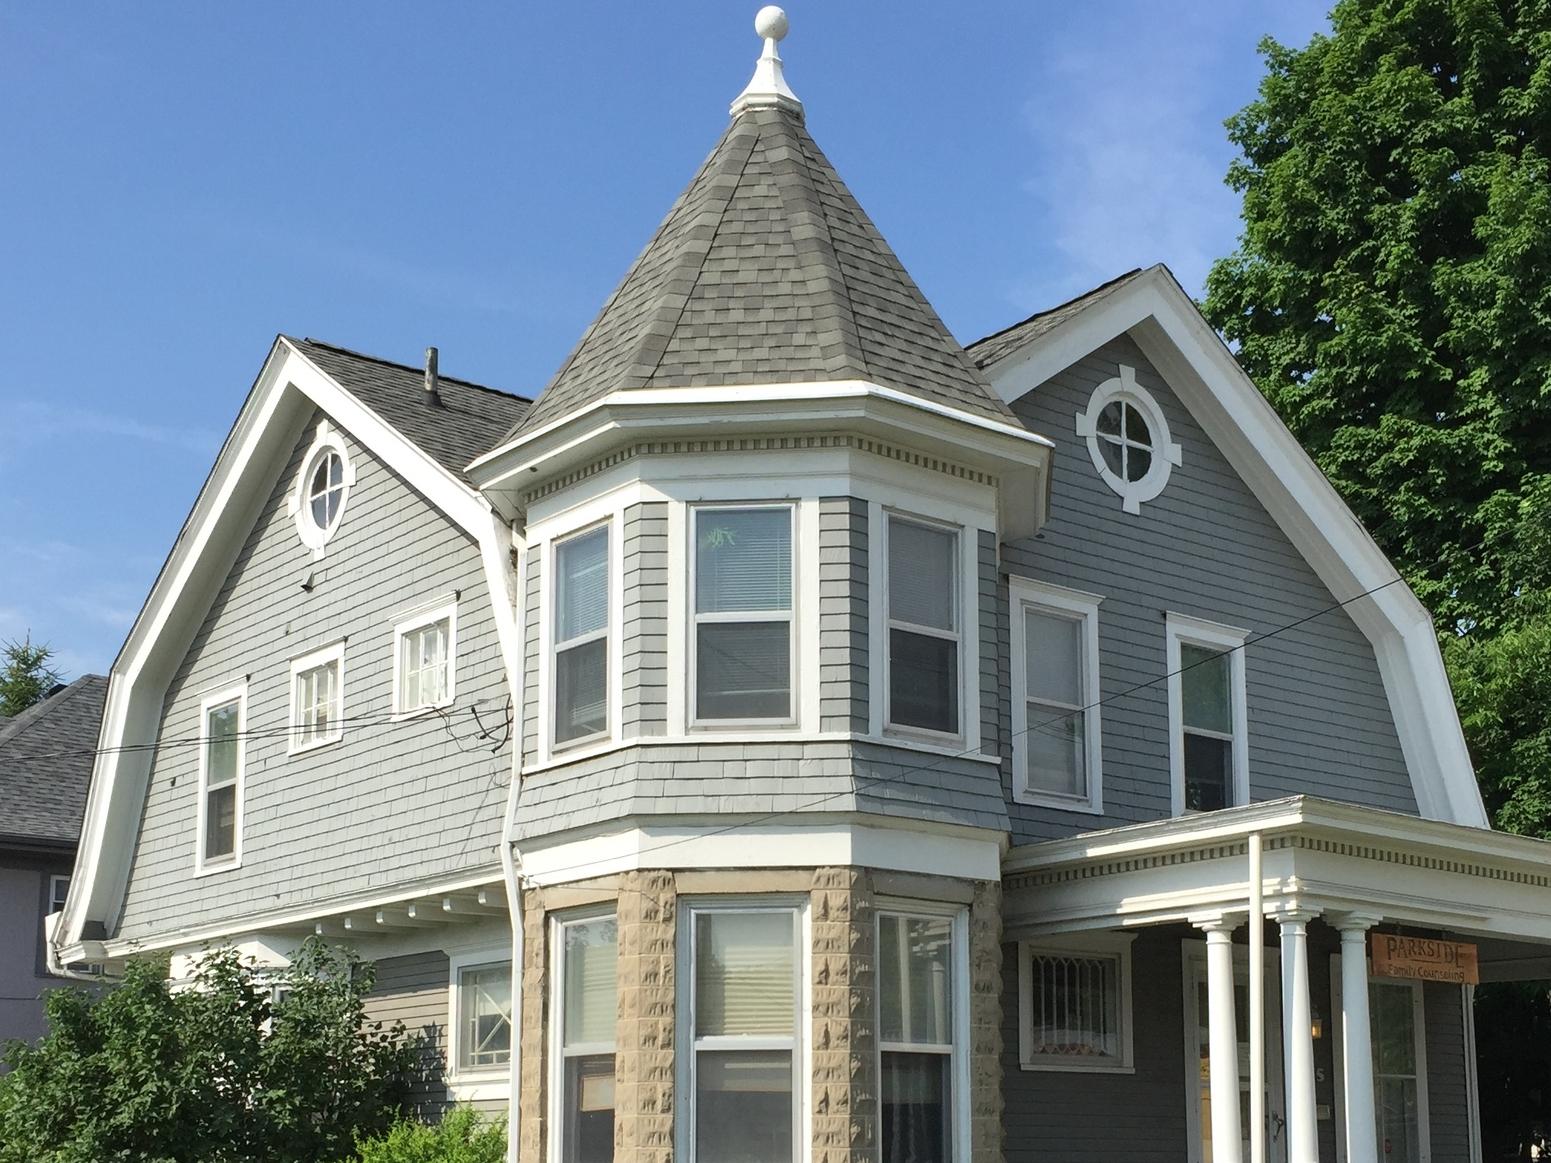 Cross Gambrel Roof--Shingle Style